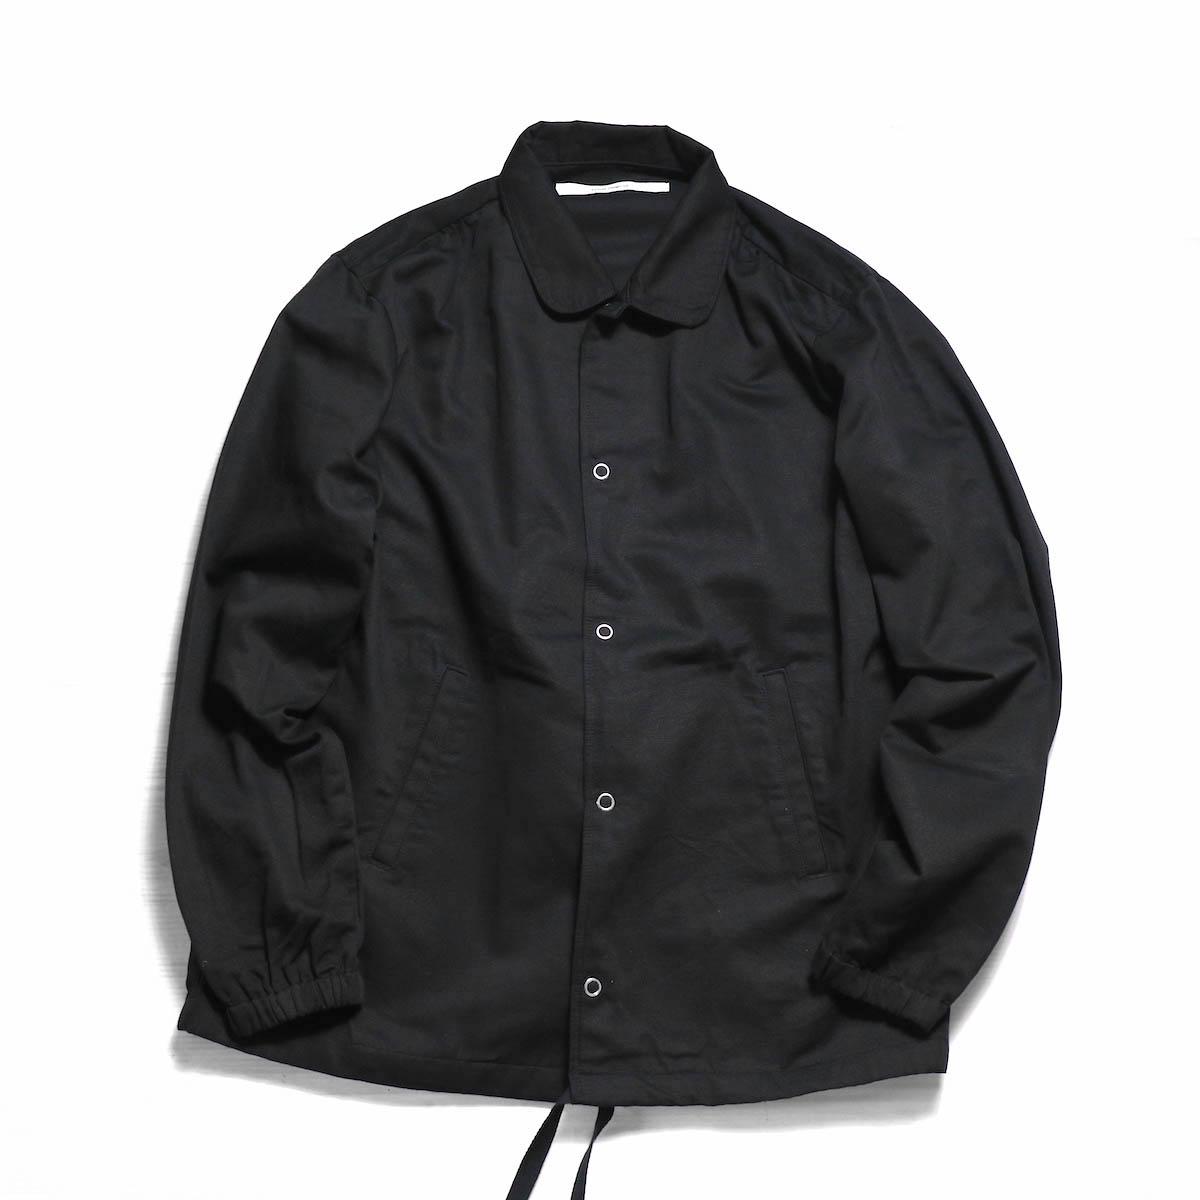 FUTURE PRIMITIVE / FP COACH JKT -BLACK